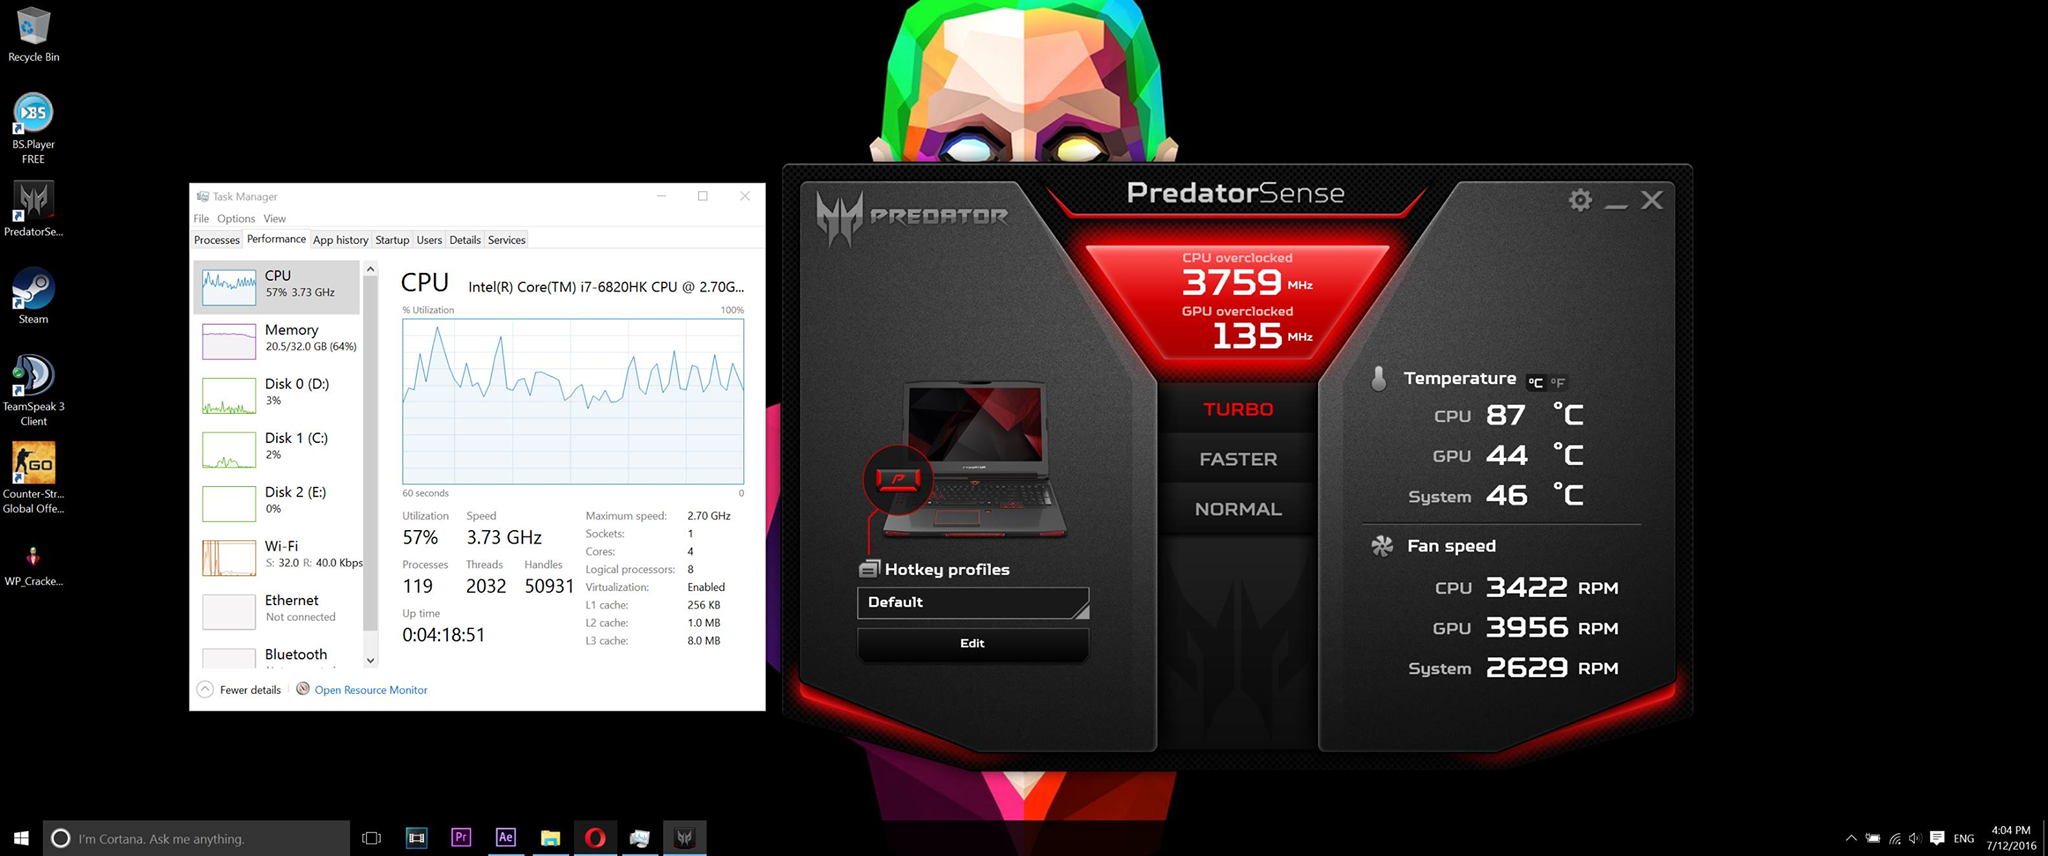 Acer Predator 17X (GX-791) rendering stats